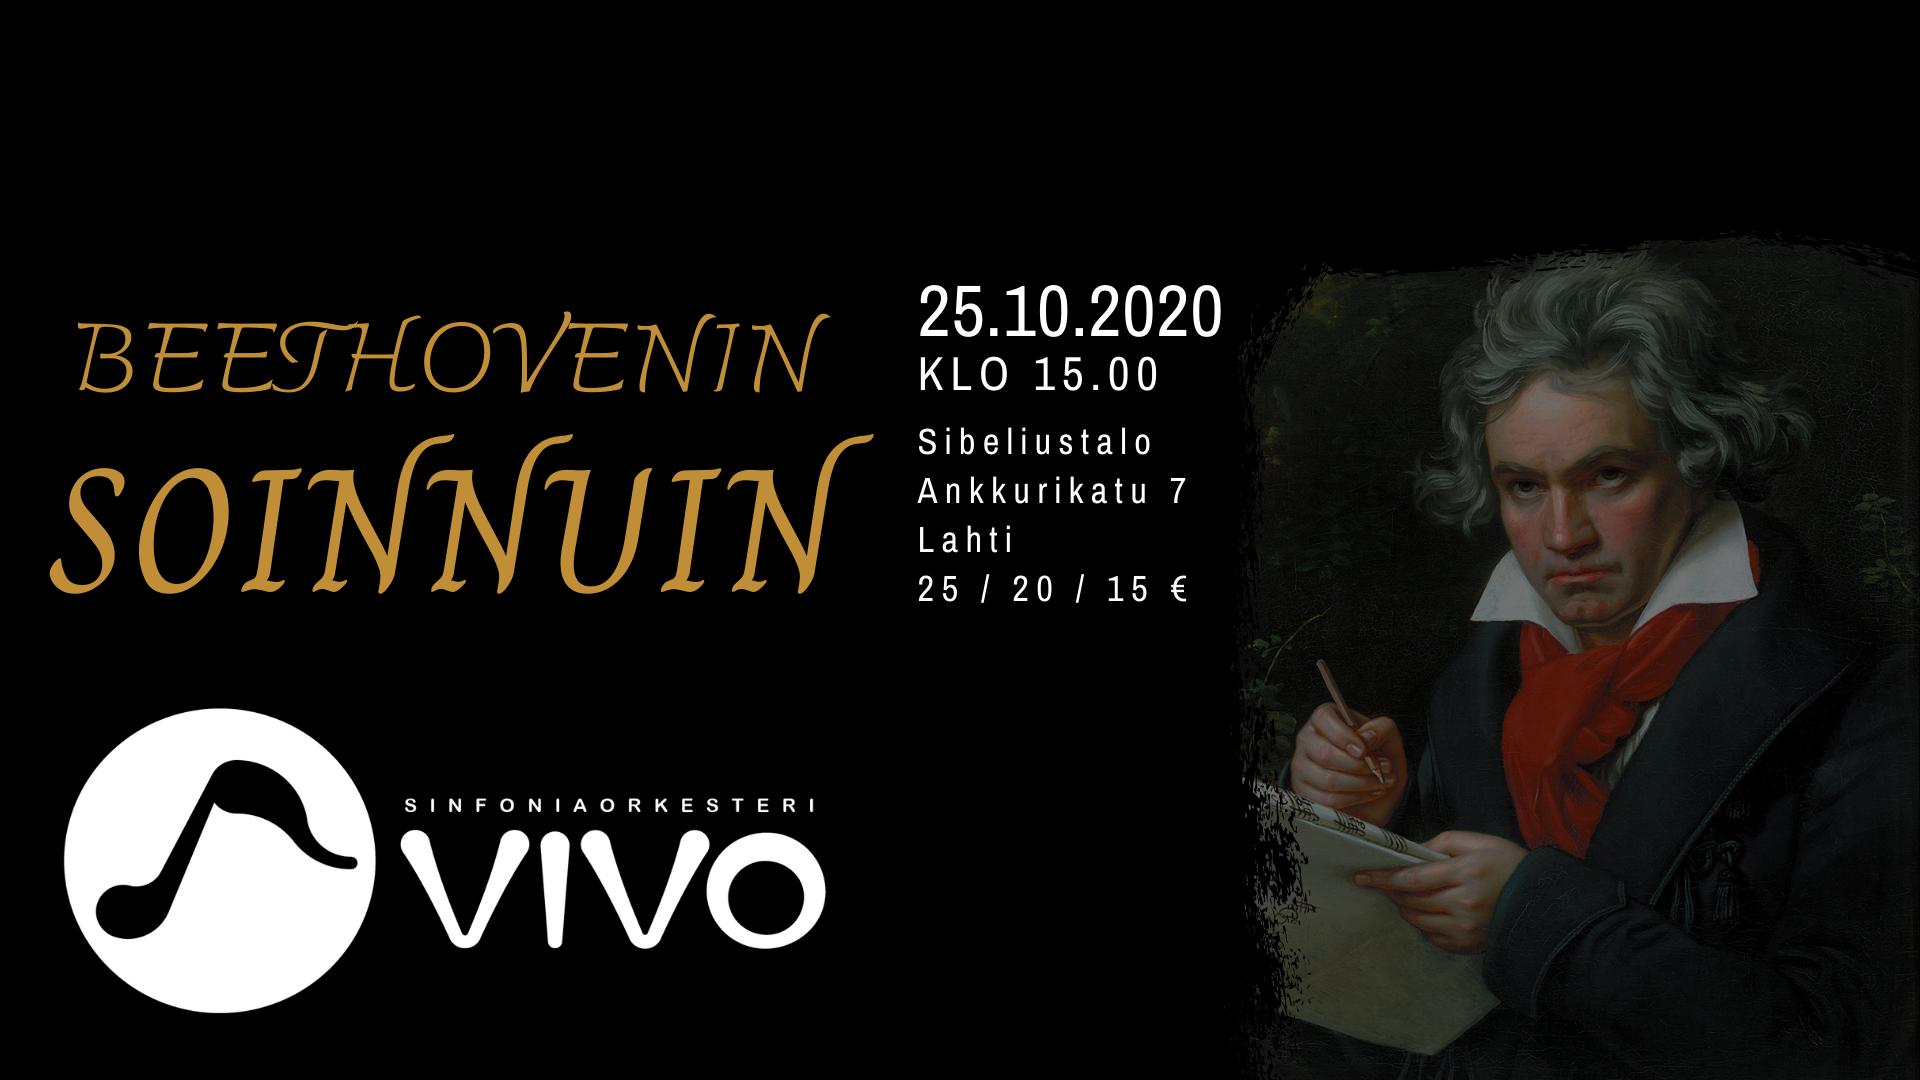 Beethovenin soinnuin